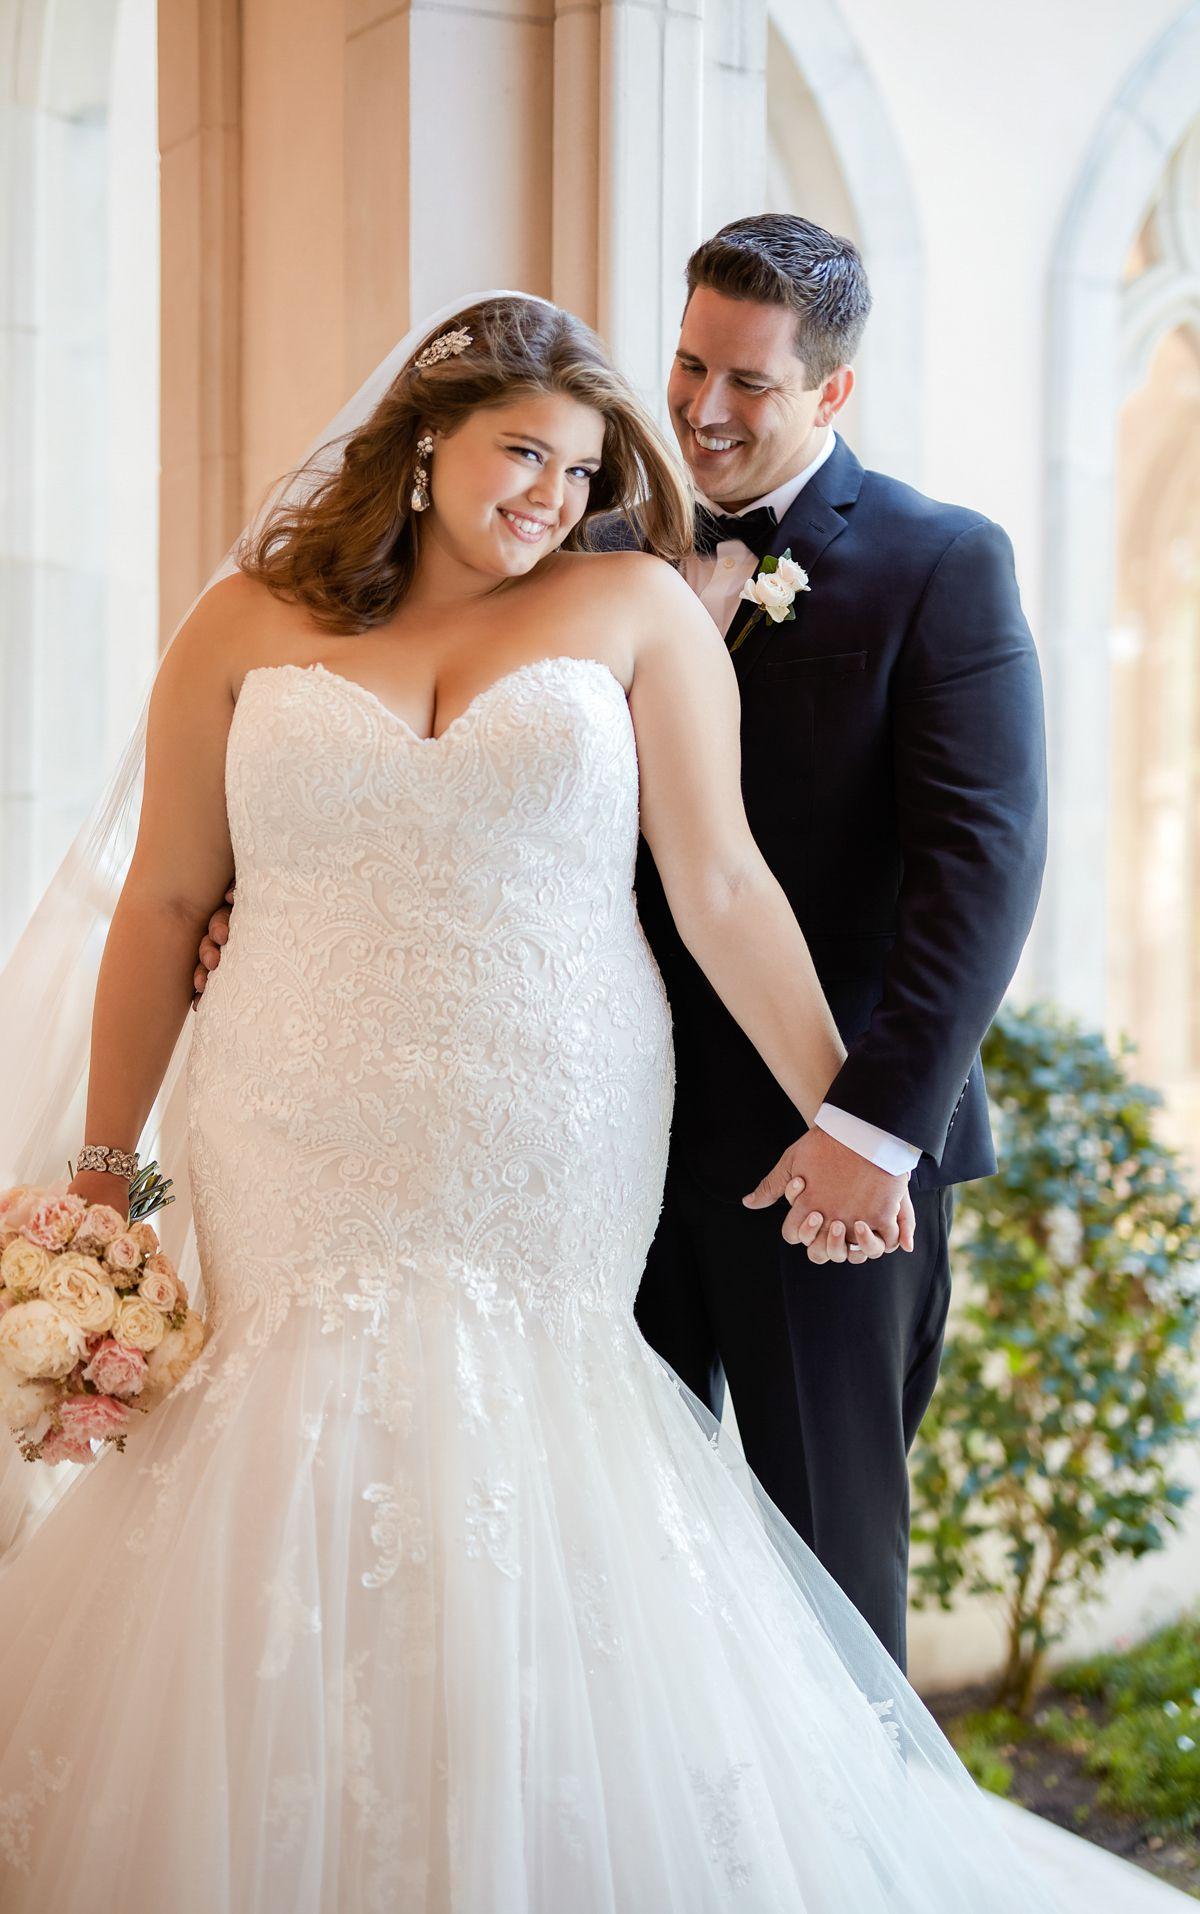 Blue plus size wedding dresses  Lace Wedding Dresses  Stella york Lace wedding dresses and Lace